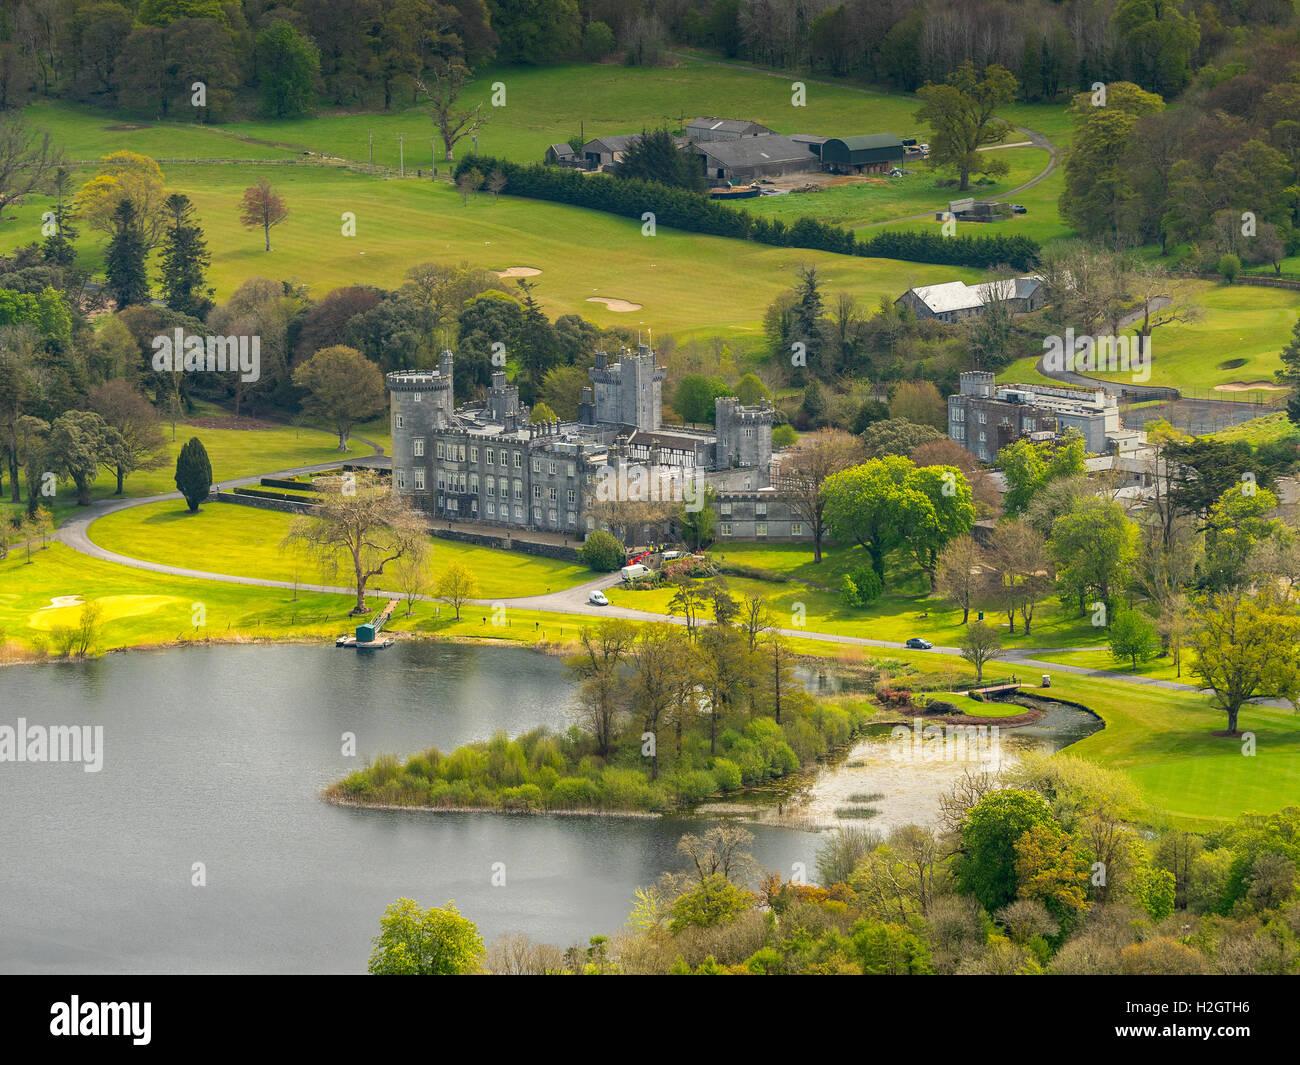 Luxurious Dromoland Castle Hotel, County Clare, Ireland - Stock Image